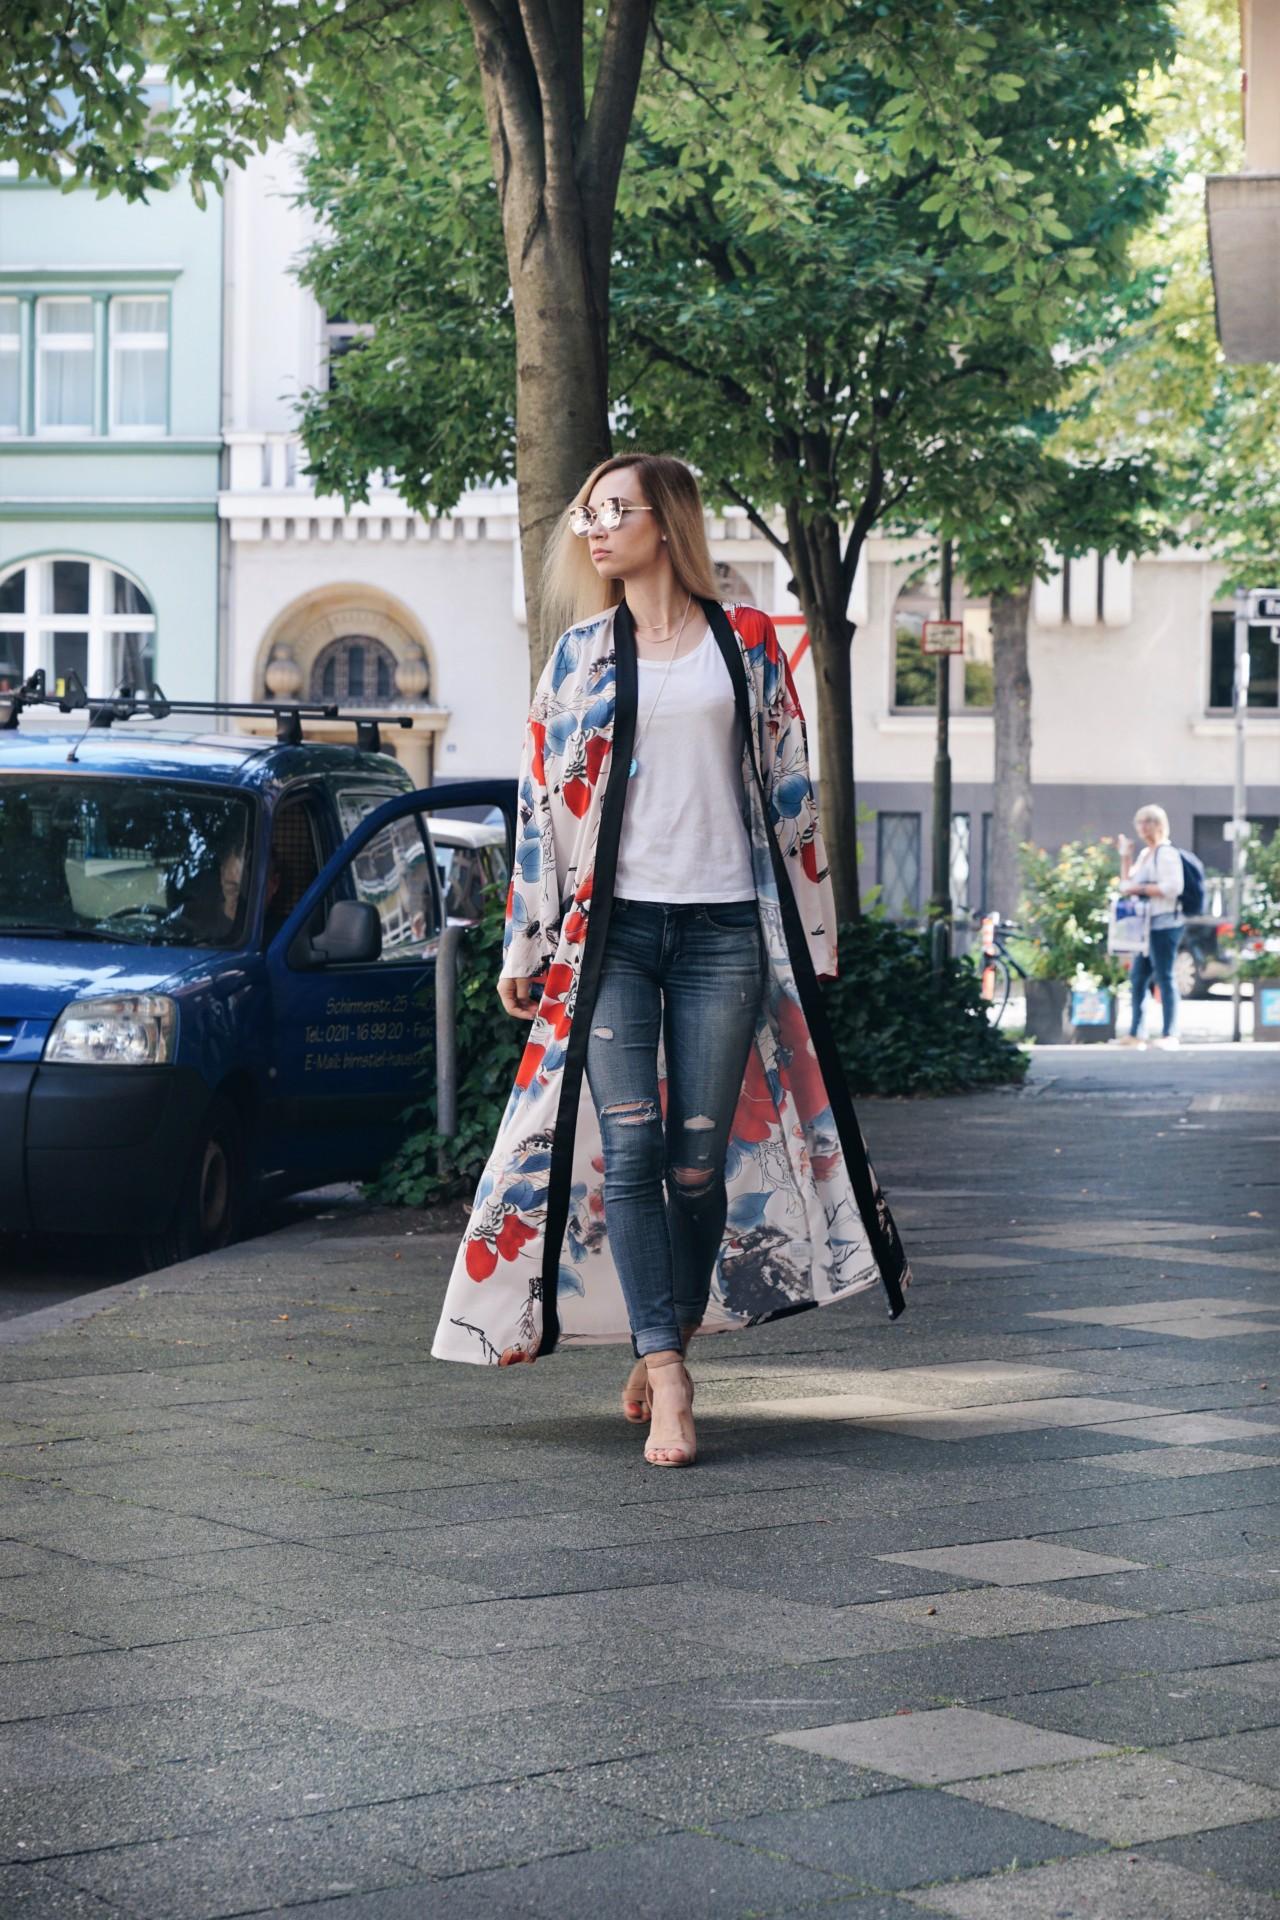 dbkstylez_streetstyle_fashion_bestblog_kimono_bathleisure_stil_mode_стиль_кимоно_фэшн